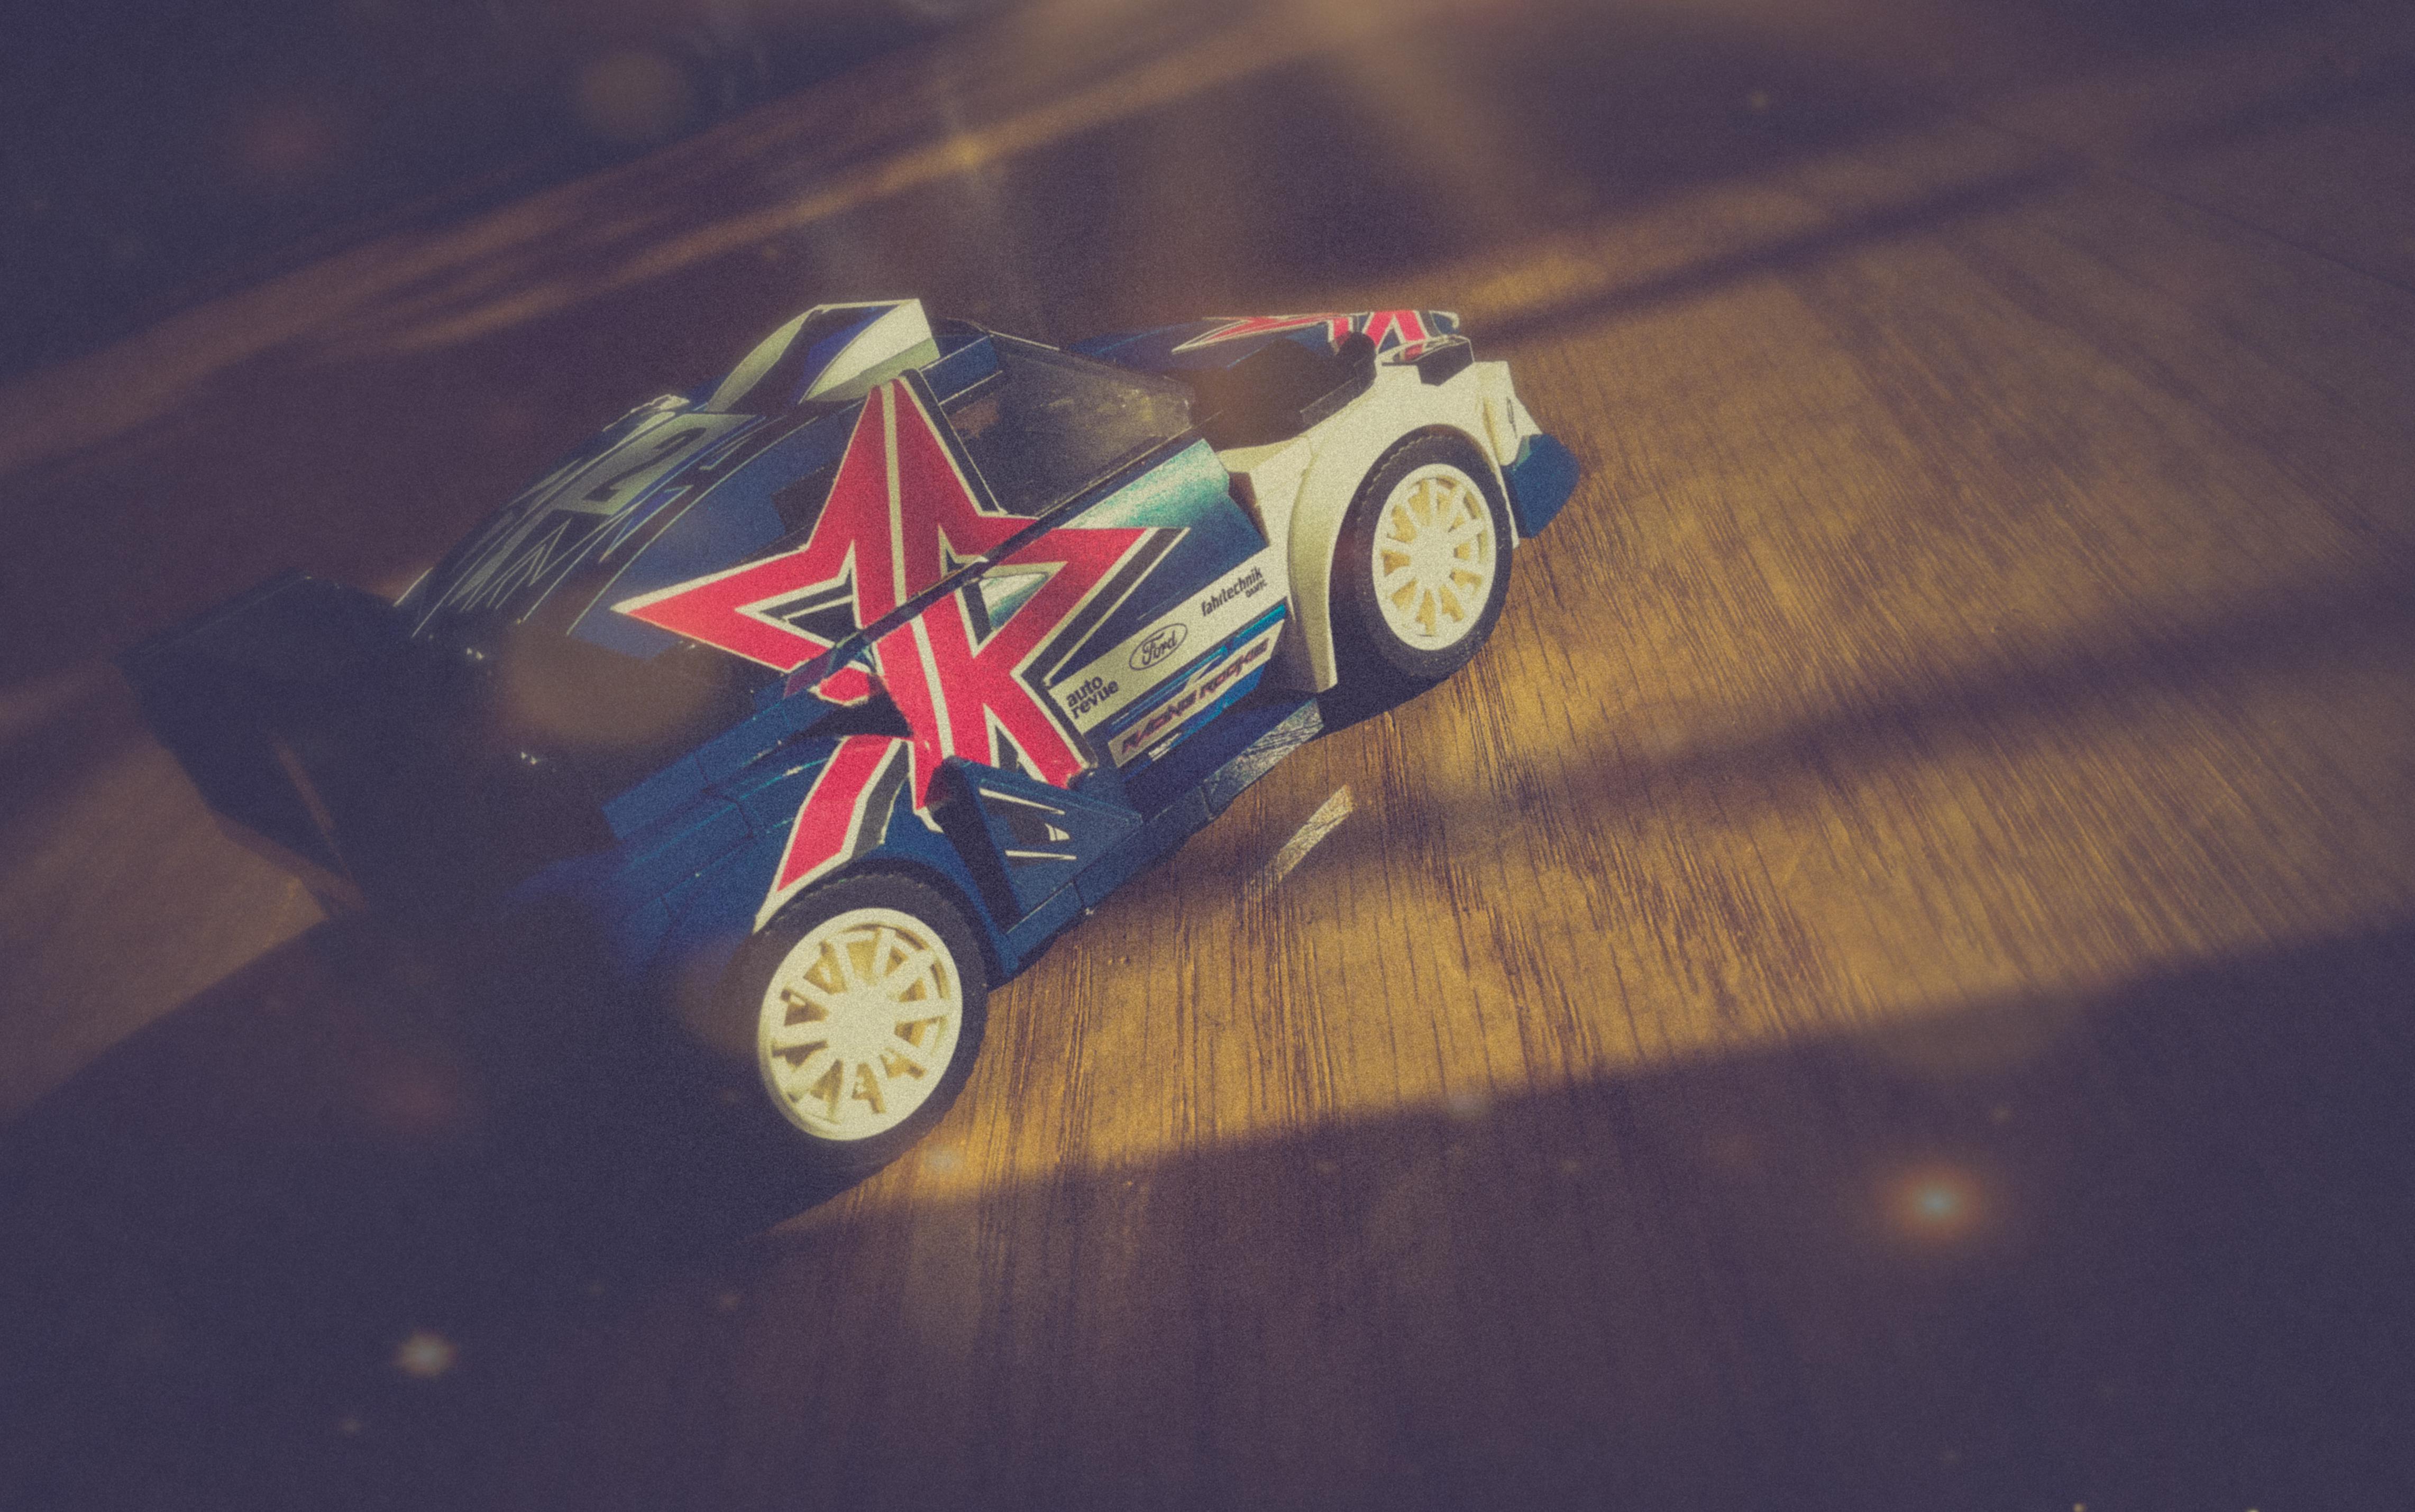 RacingRookie2019_Lego-Ford-Fiesta_Speedchampion_RookieEdition_AUTrenalinStudios-05.jpg